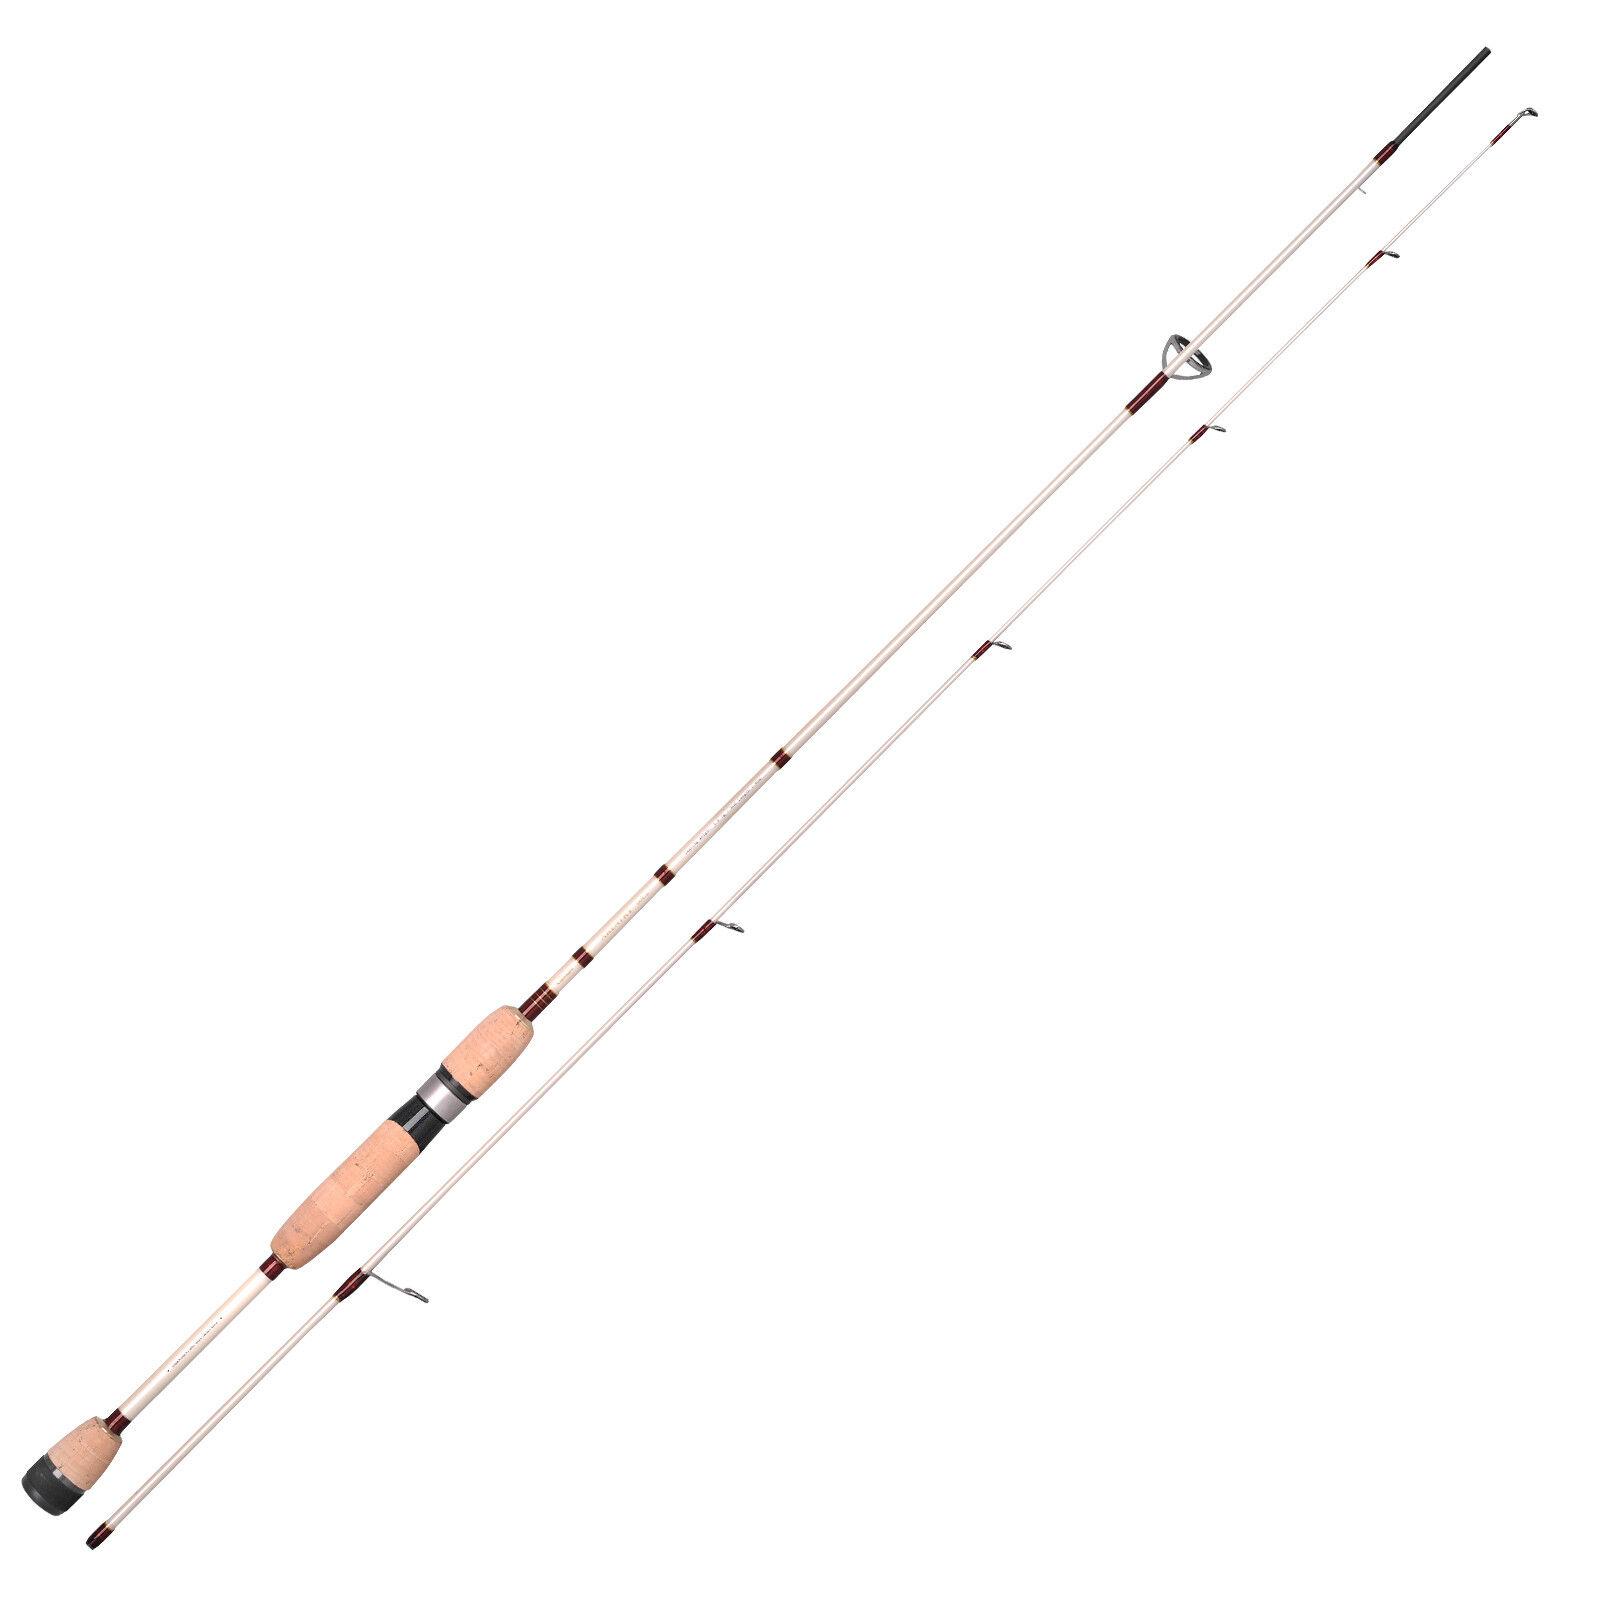 GAMAKATSU Ultralight stadia canna da pesca a pesca spigola stadiaareatry 66l 1,98m 110g